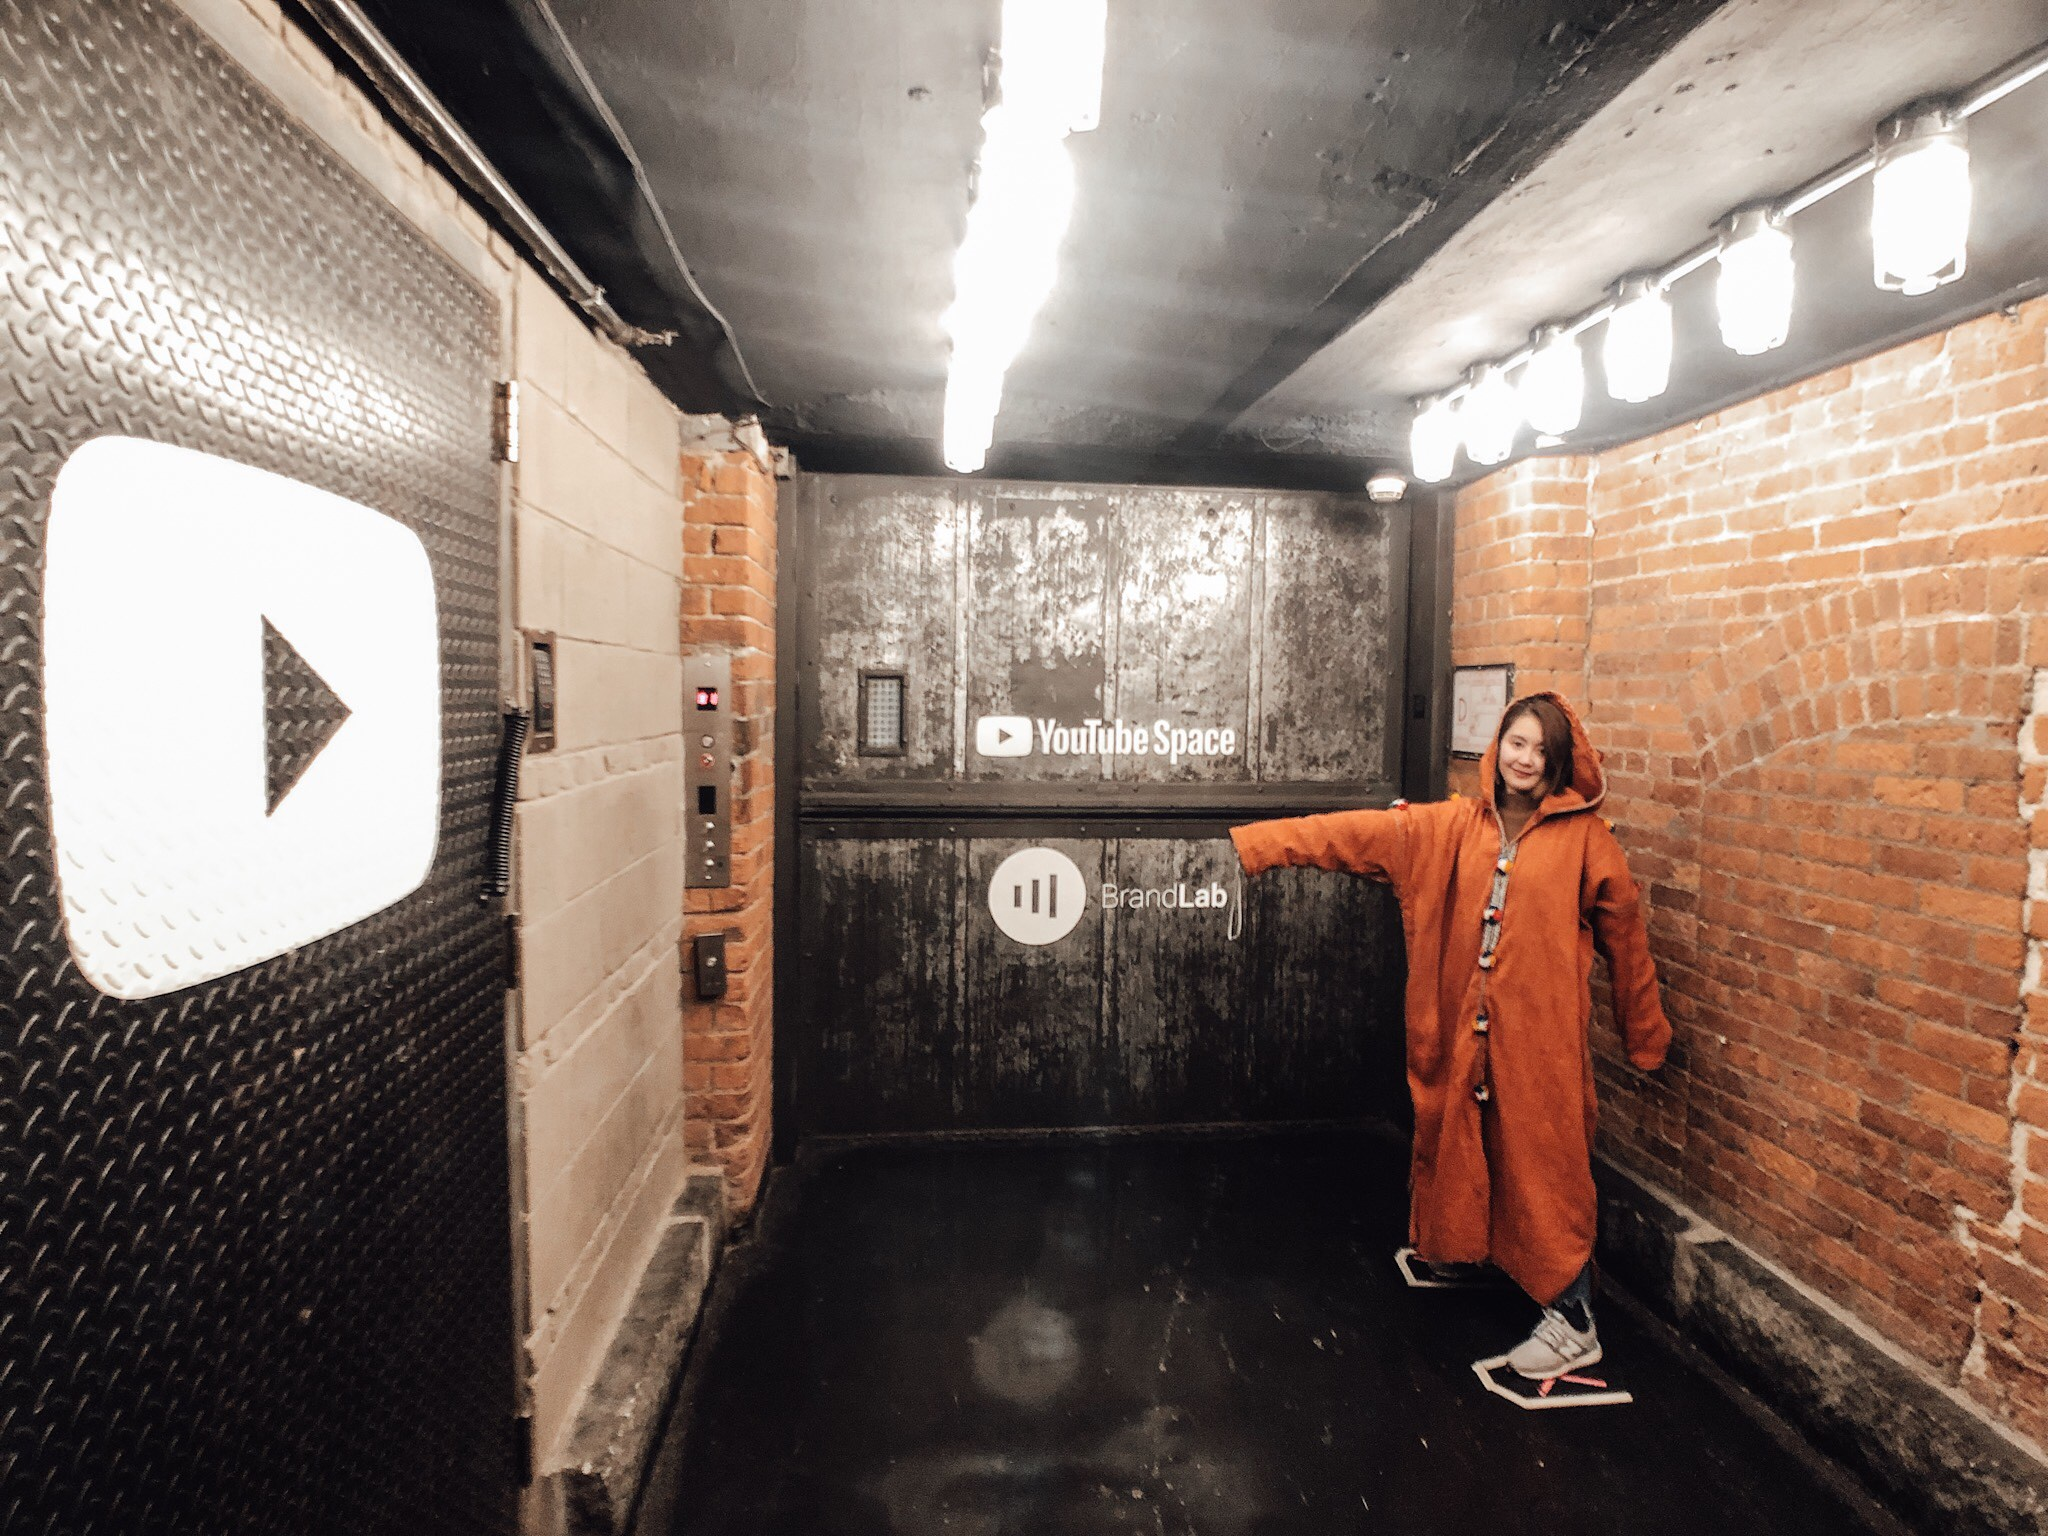 美國|紐約New York 雀兒喜市場Chelsea Market-私房IG打卡景點YouTube office